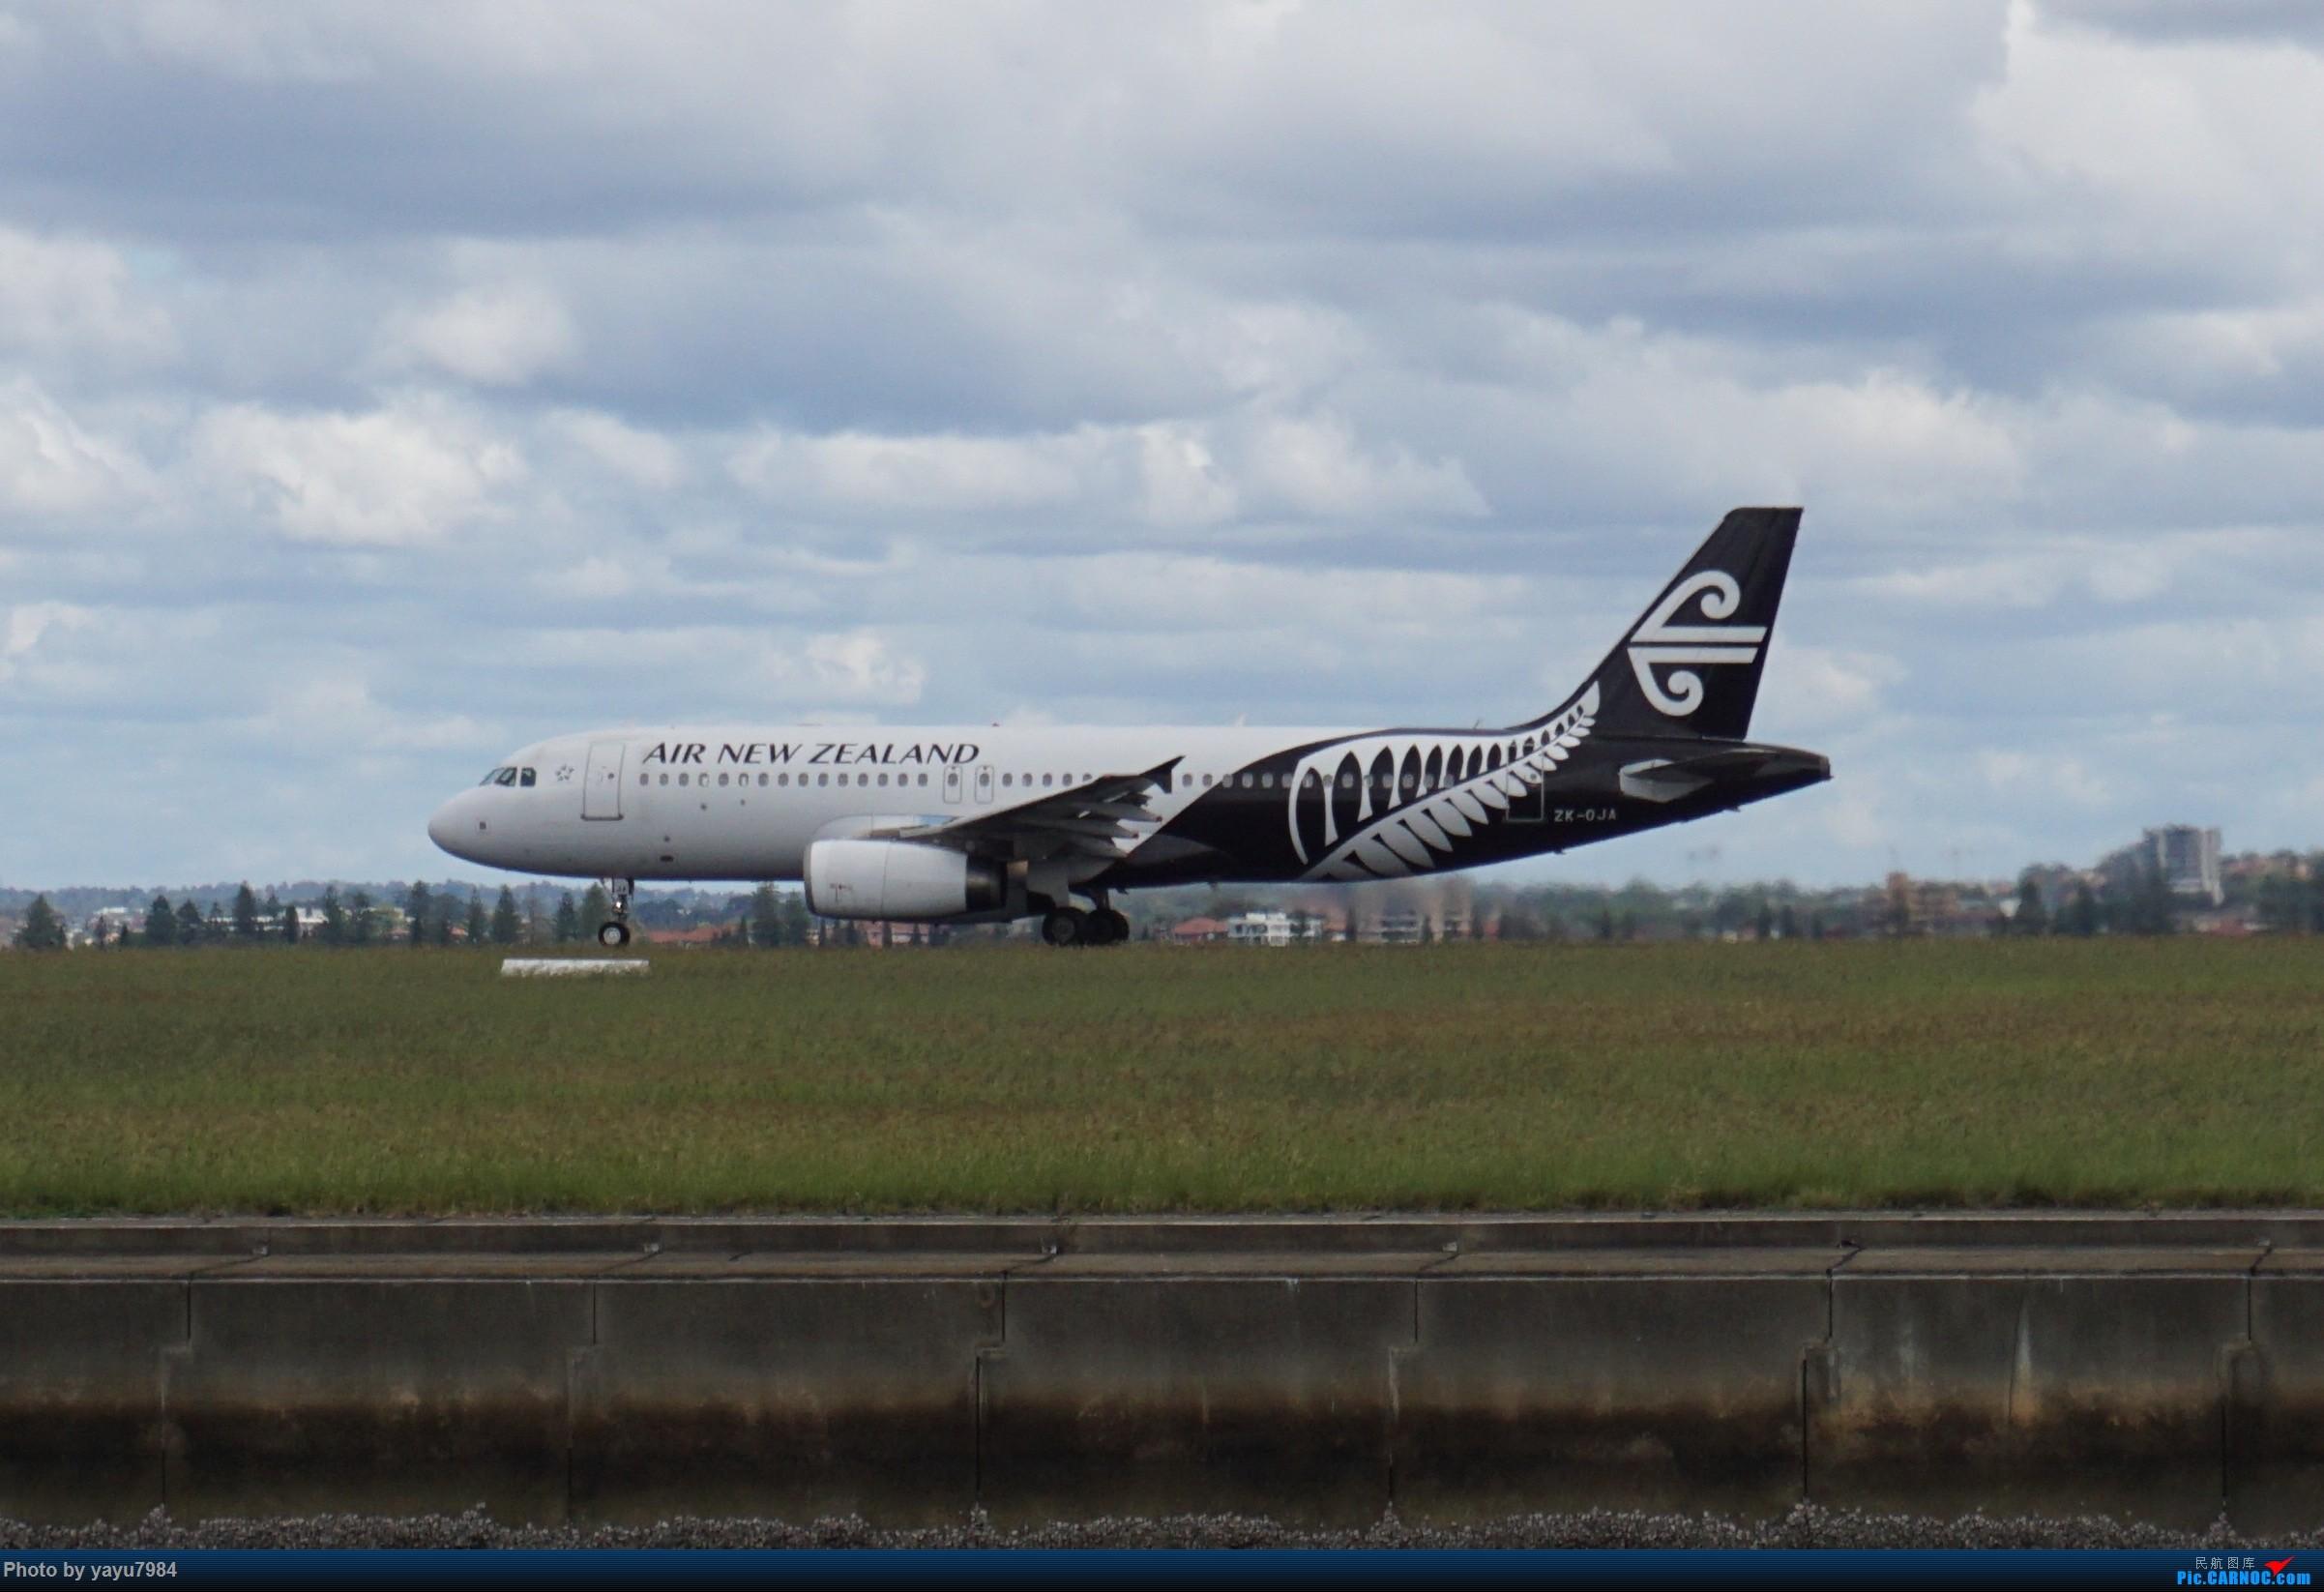 Re:[原创][SYD] 开帖分享一下16L/34R,以及07/25跑道周边的新拍机点位 AIRBUS A320-200 ZK-OJA 澳大利亚悉尼金斯福德·史密斯机场